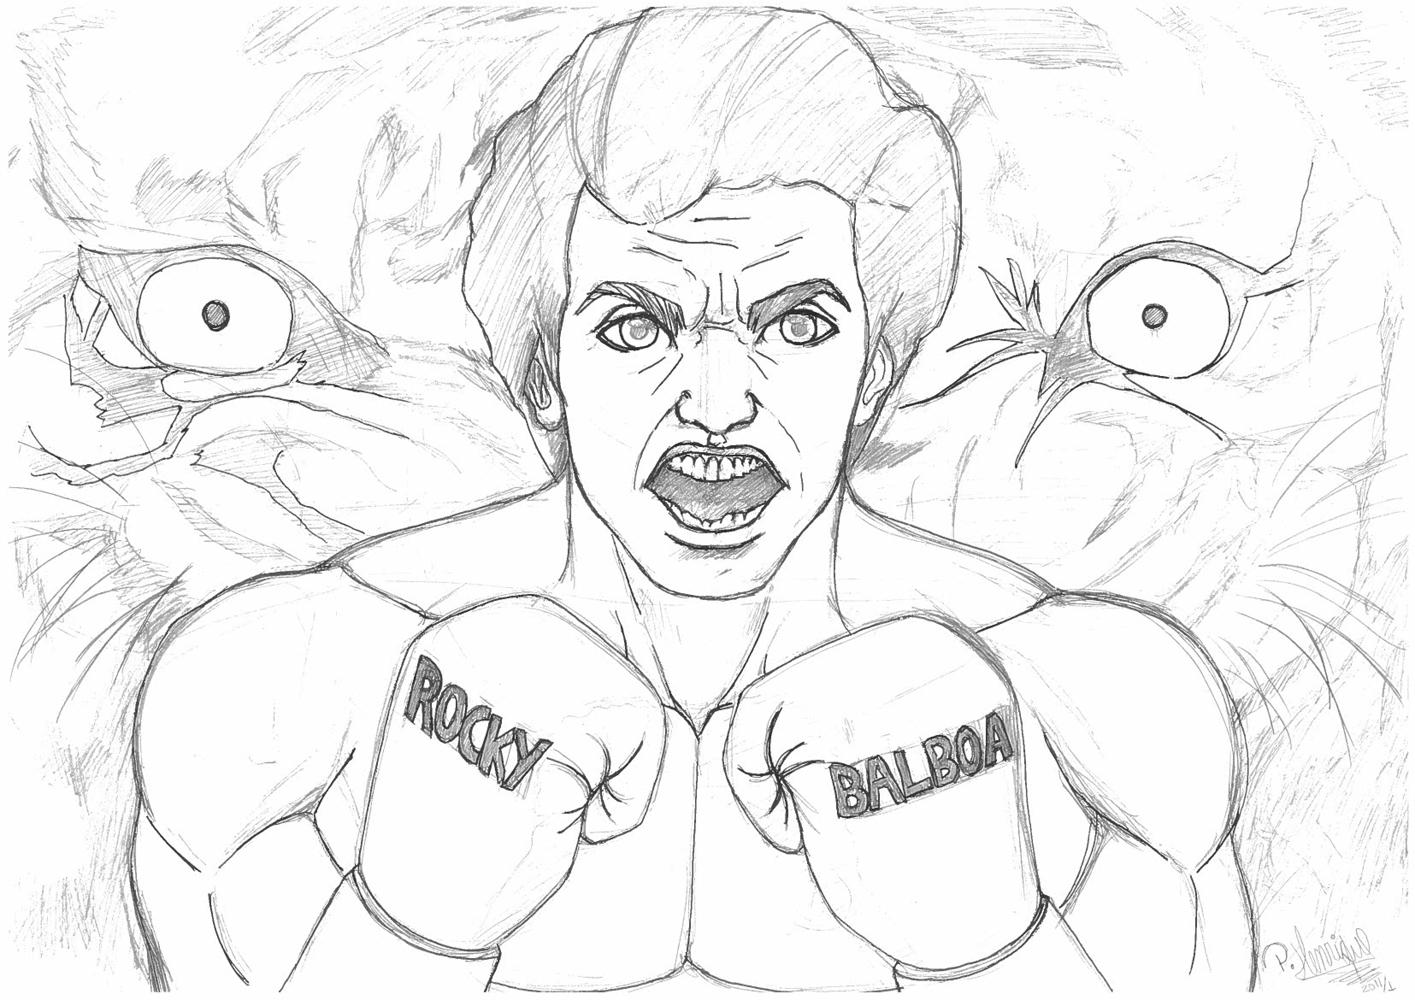 Dibujos De Rocky Balboa Para Colorear | .imagenesmy.com